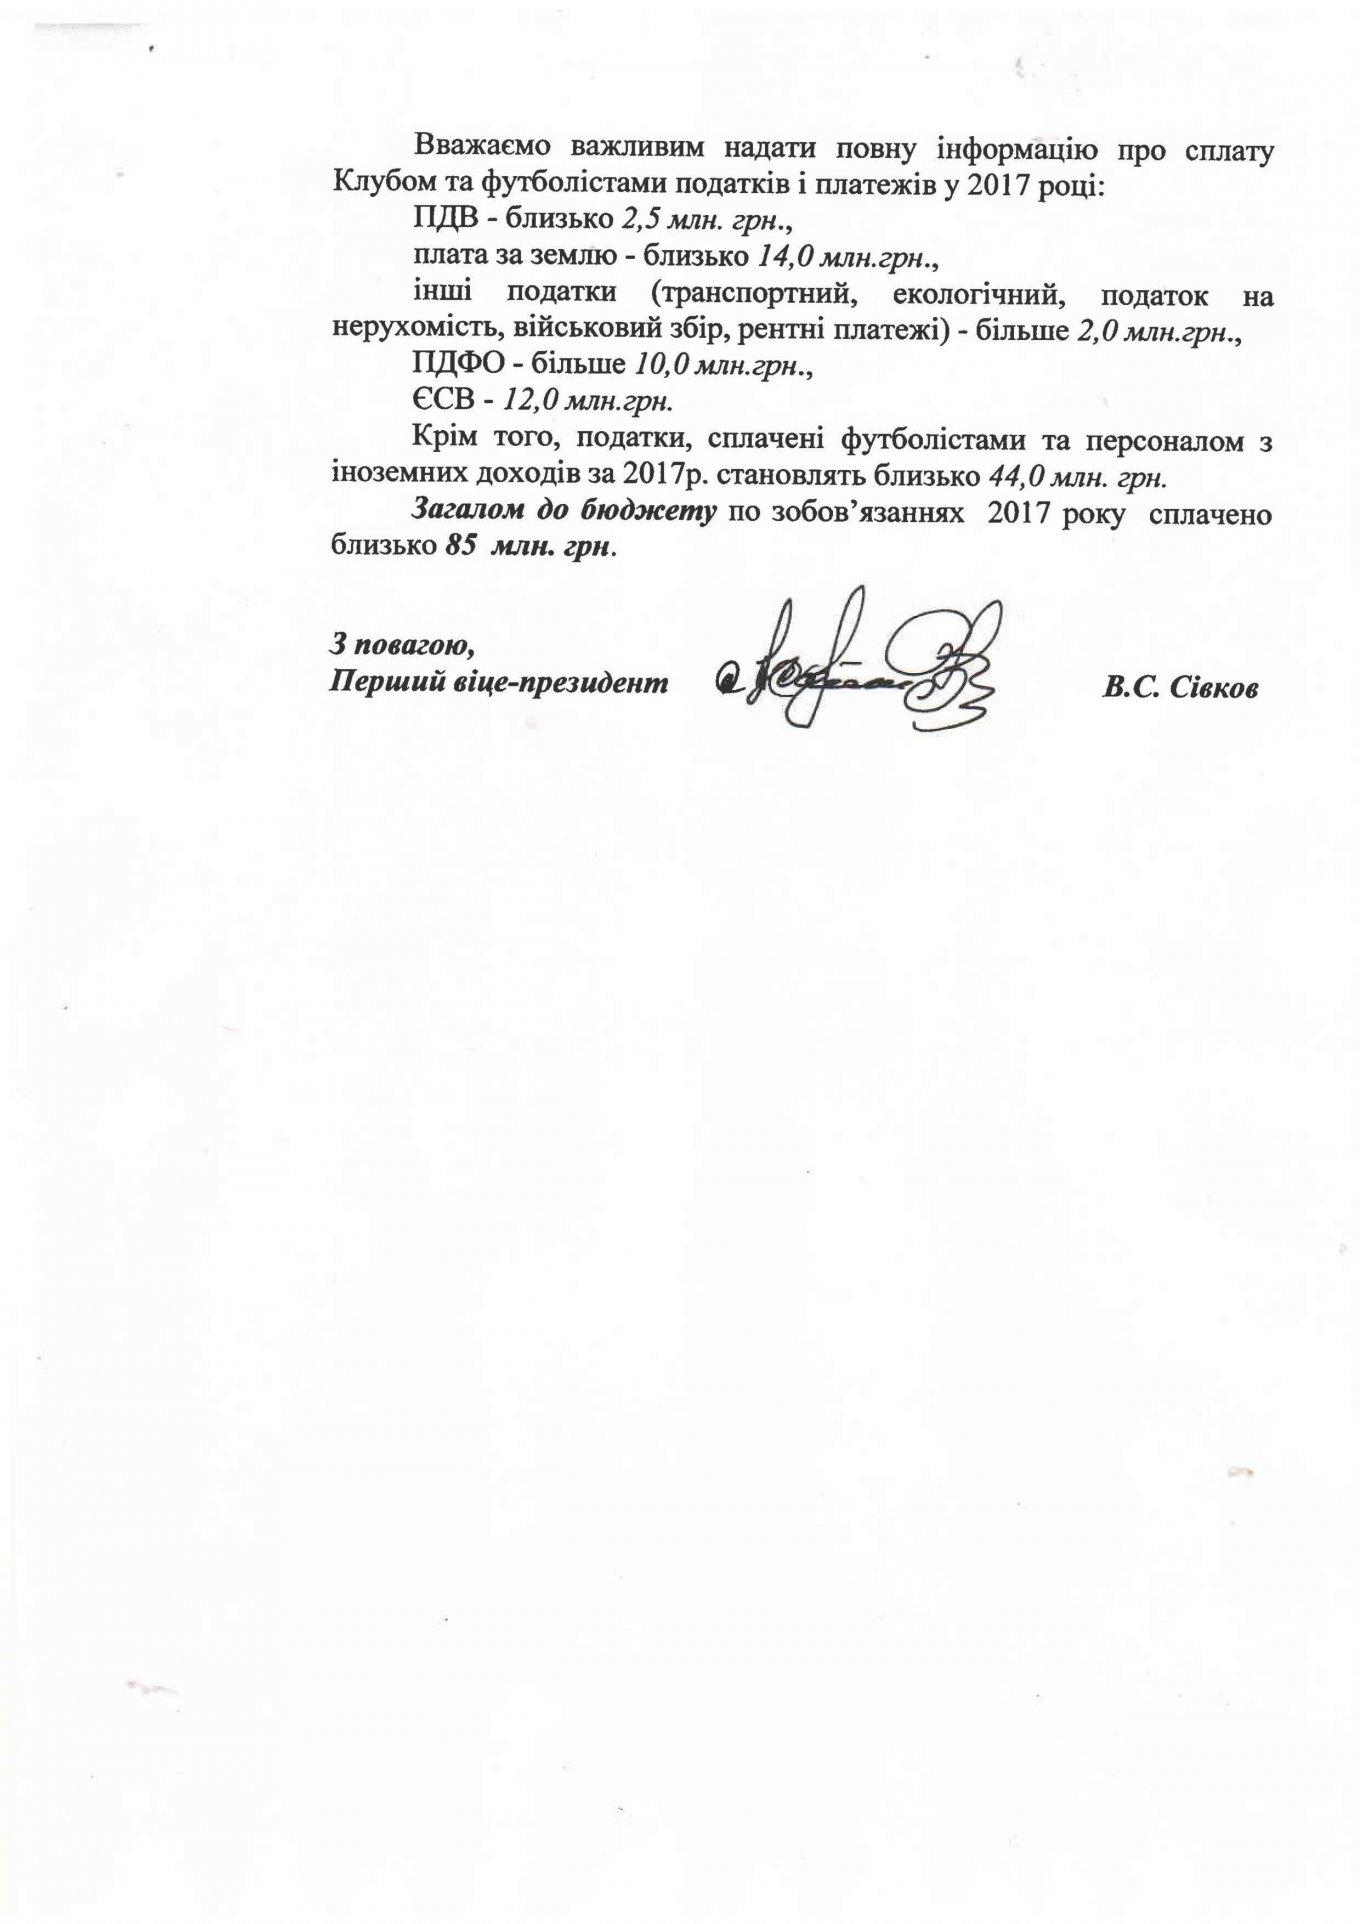 Документ об уплаченных налогах клубом Динамо